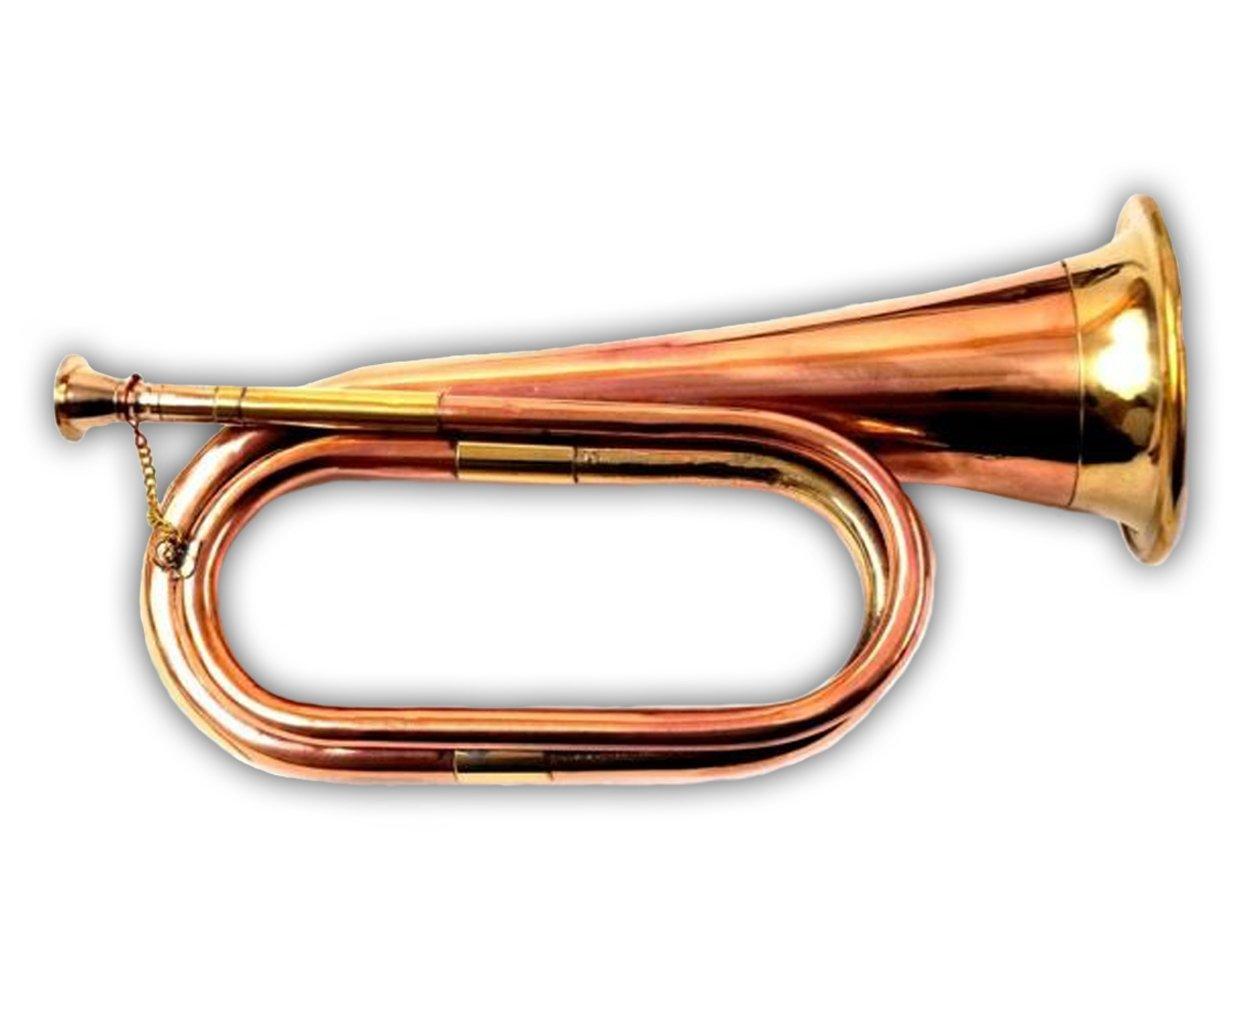 Civil War Era Solid Brass Bugle US Military Cavalry Horn New MB